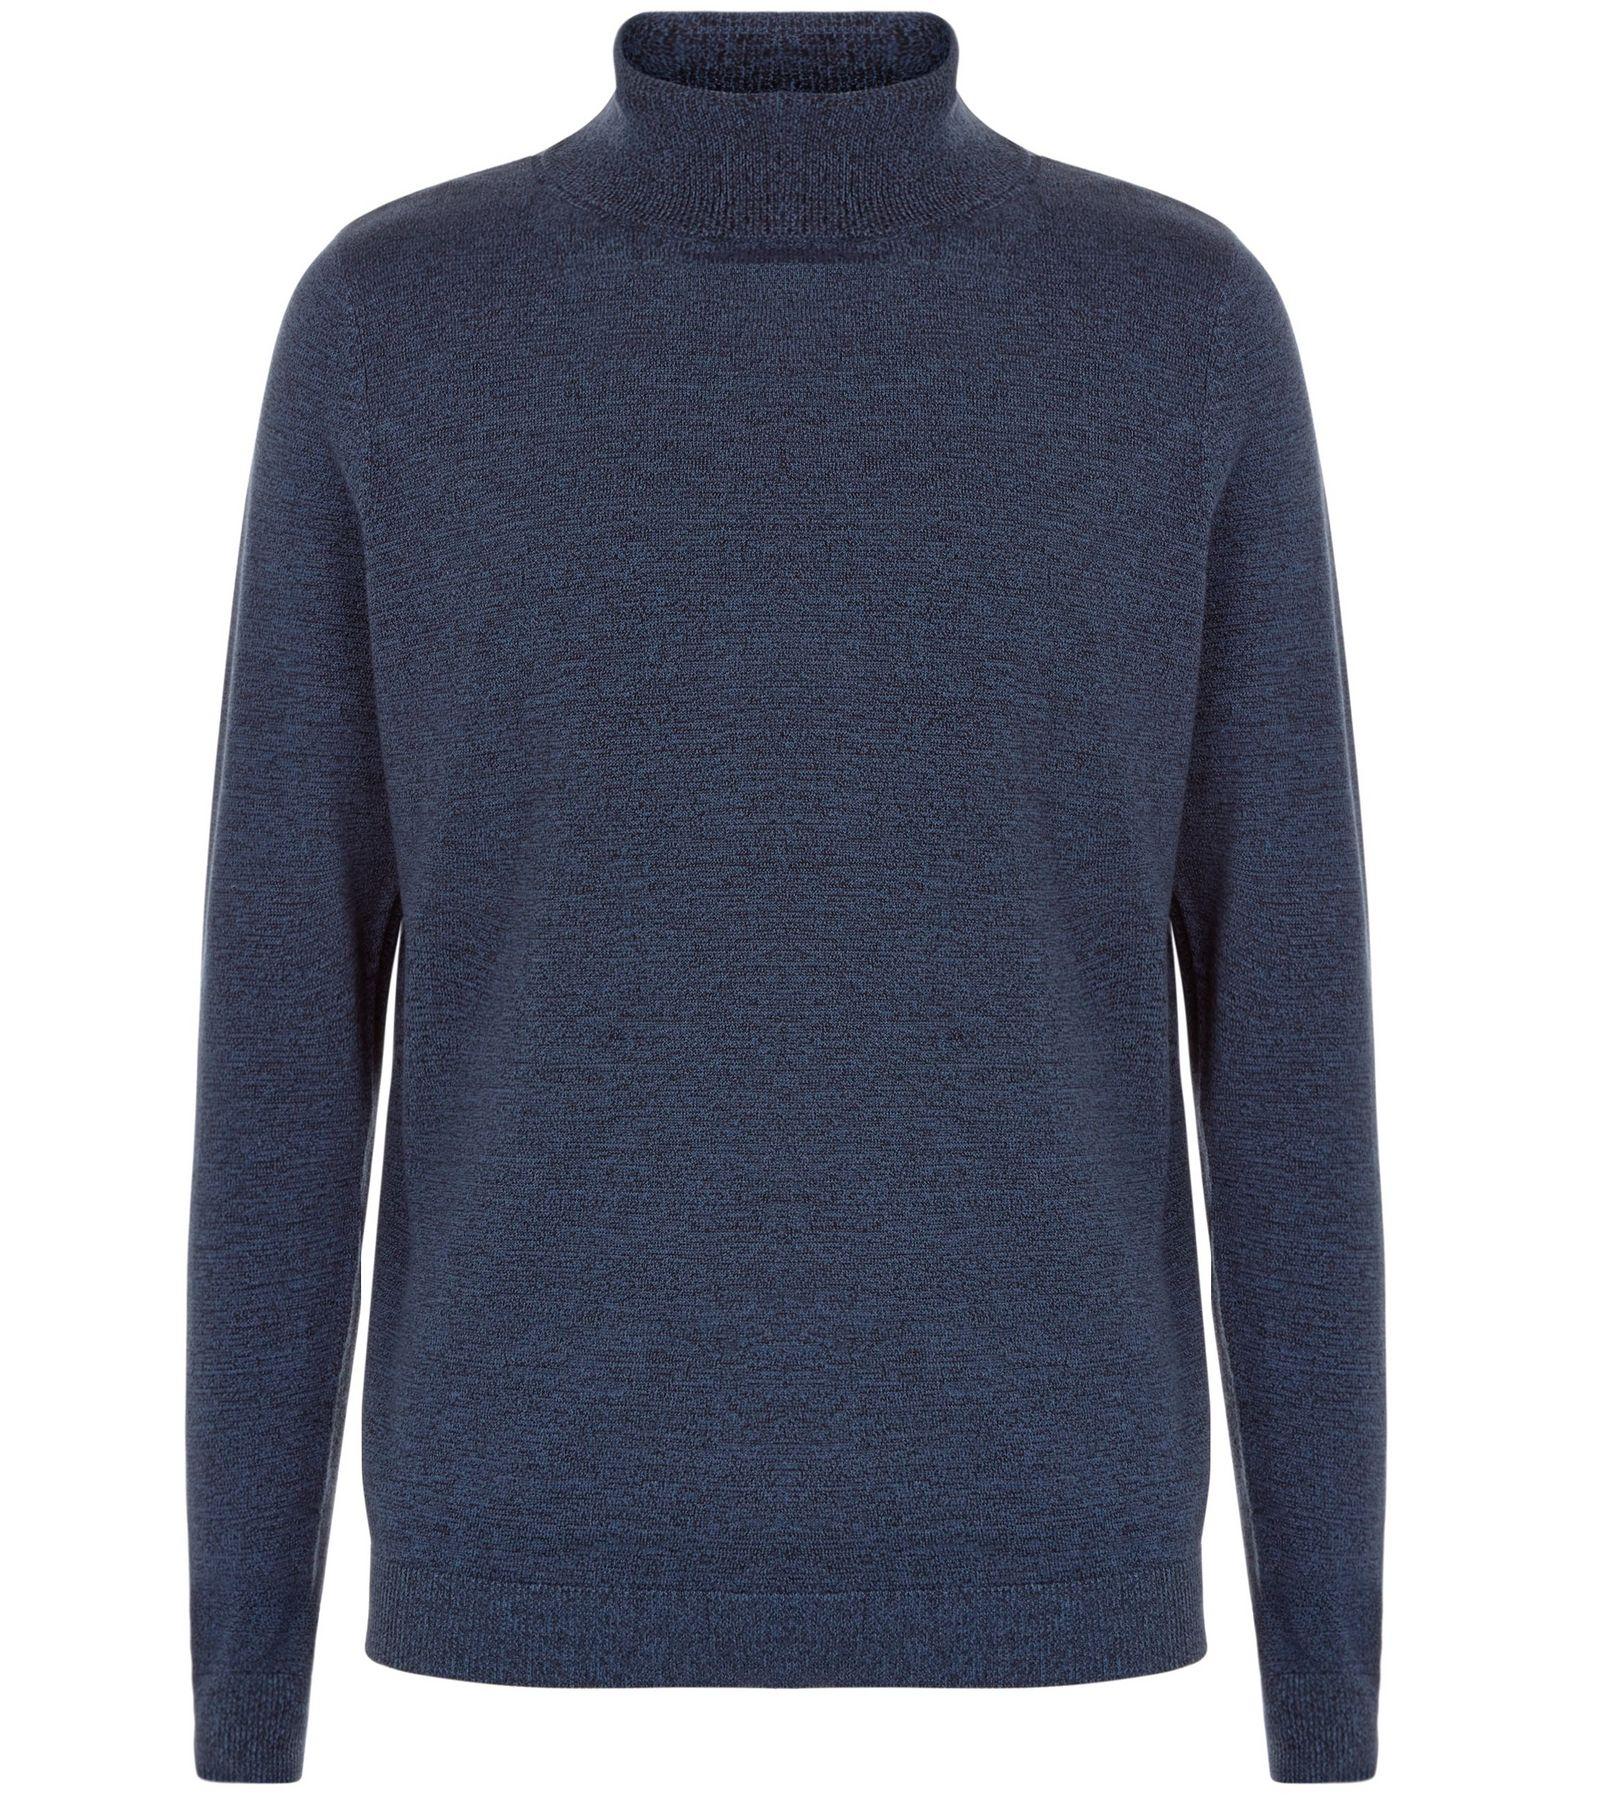 Cotton roll neck jumper, £14.99 ( newlook.com )